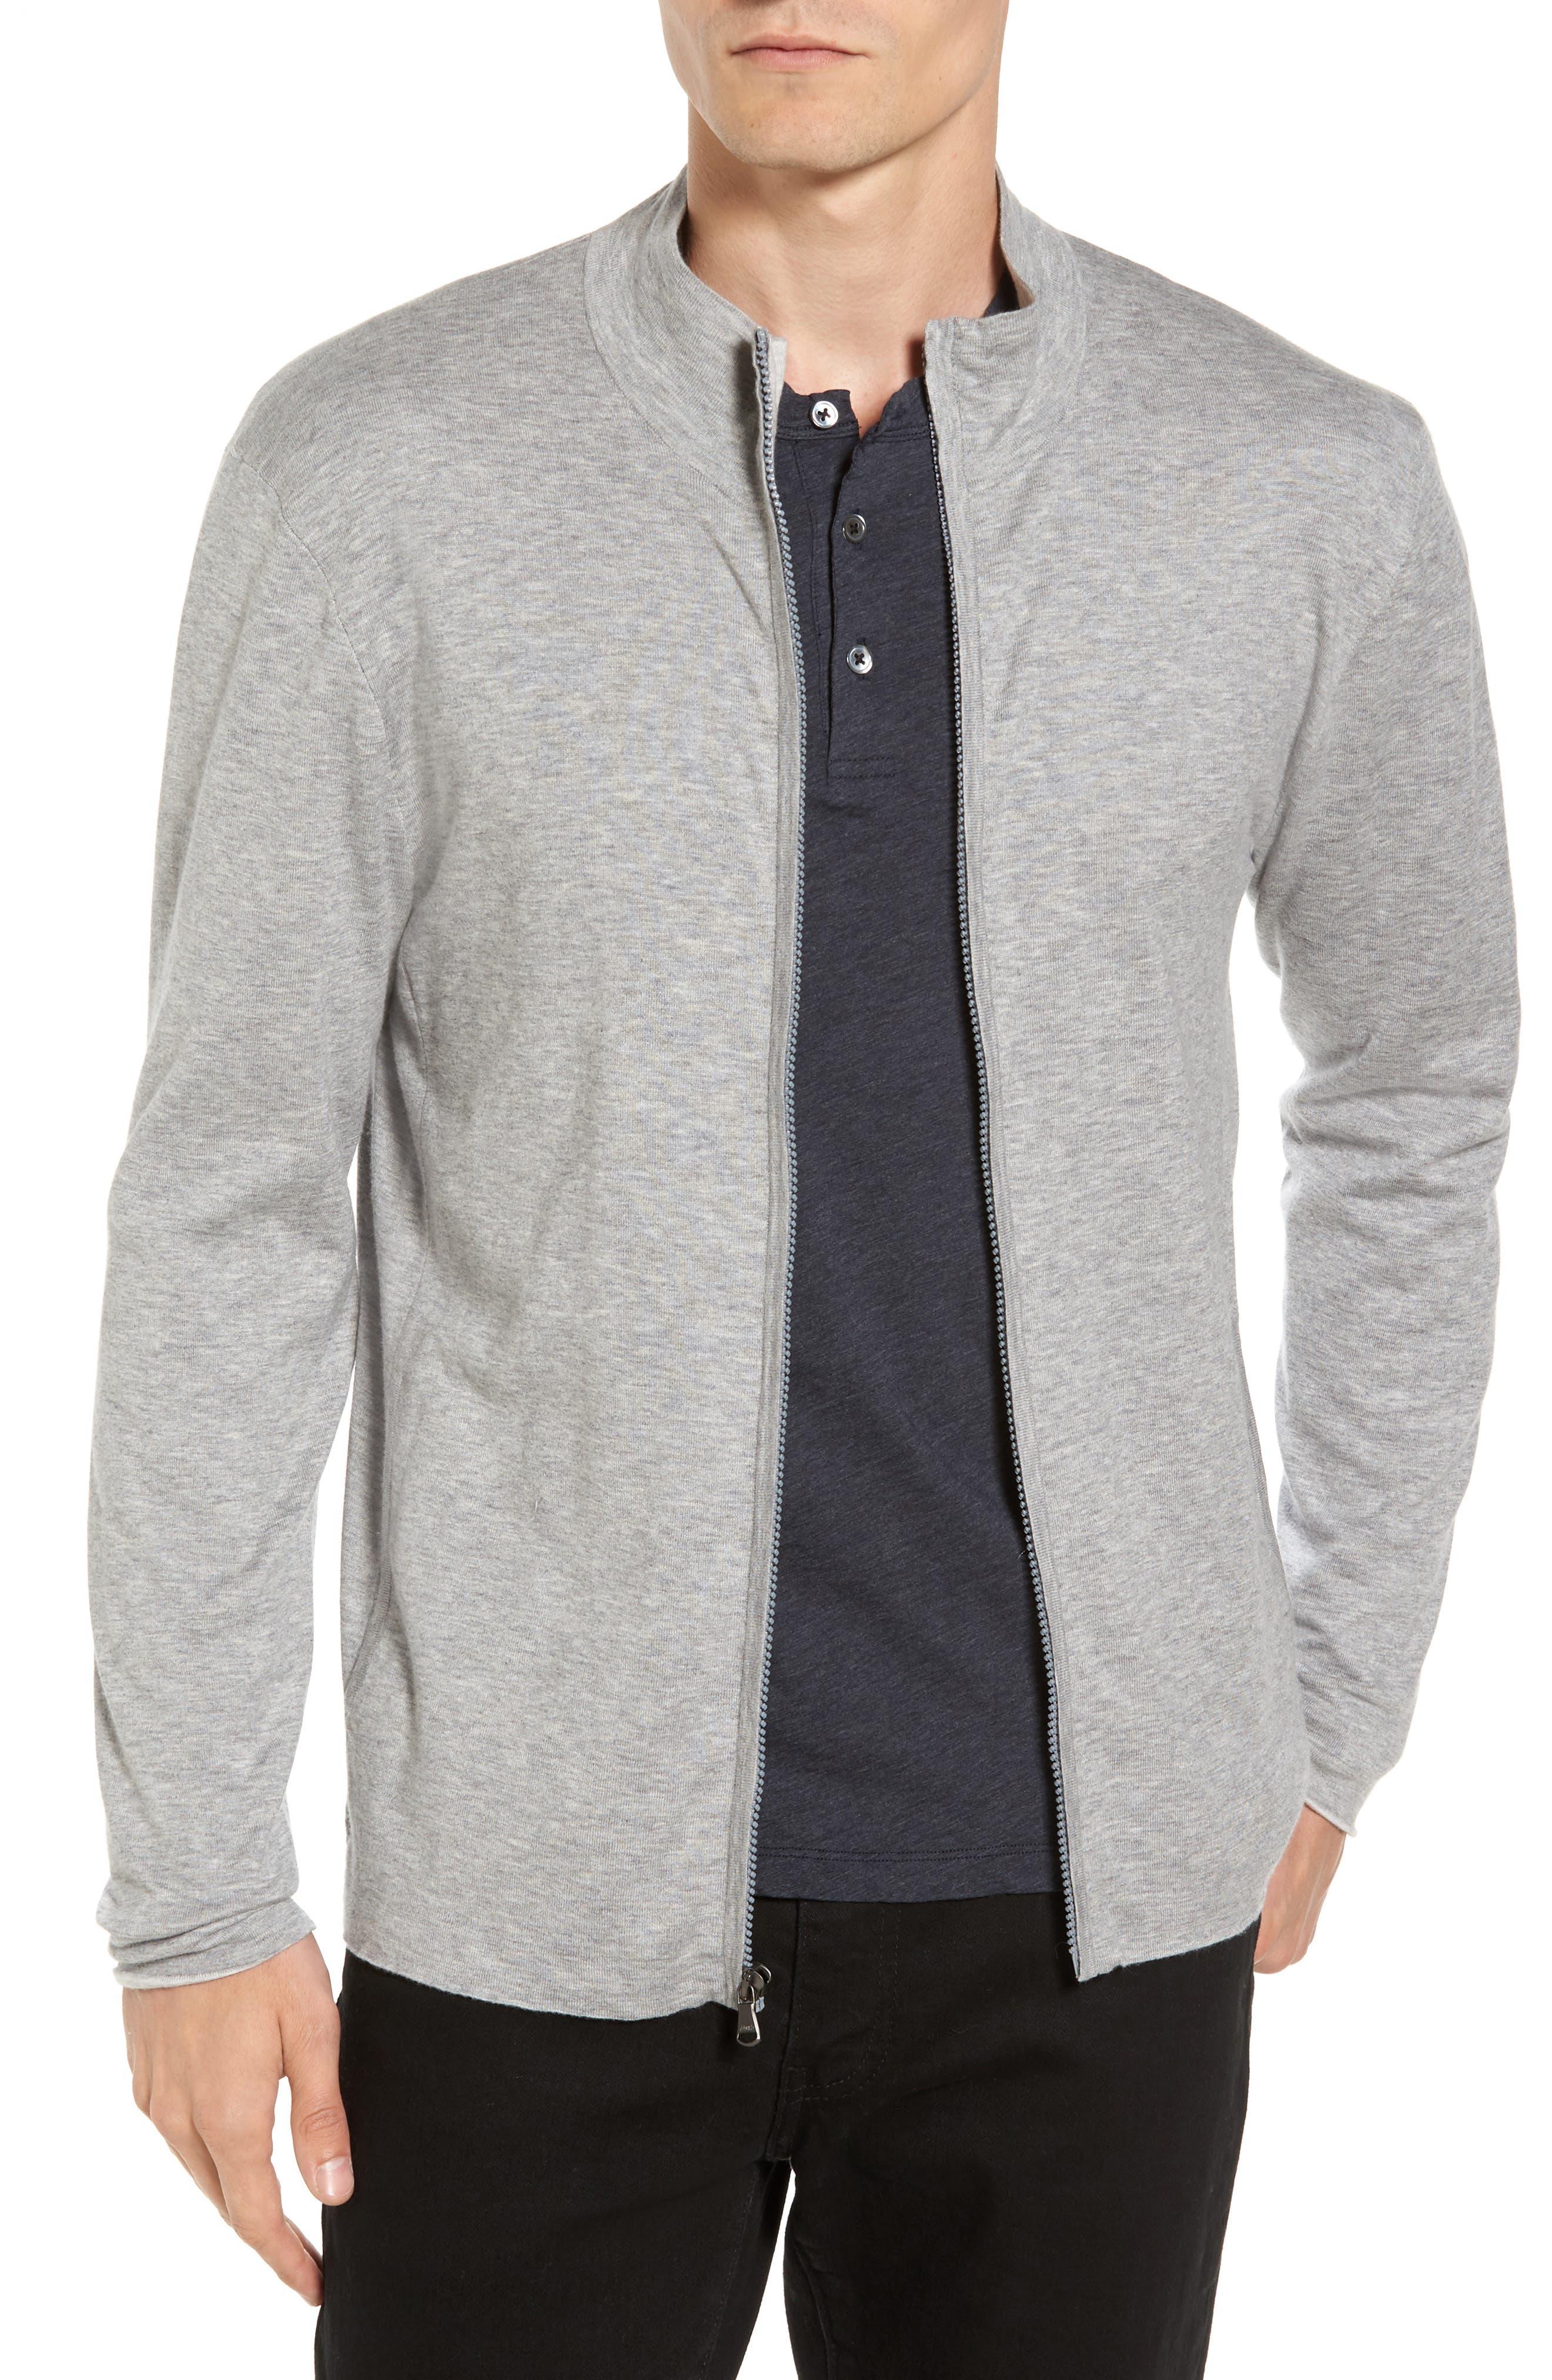 Mock Neck Zip Sweatshirt,                             Main thumbnail 1, color,                             020